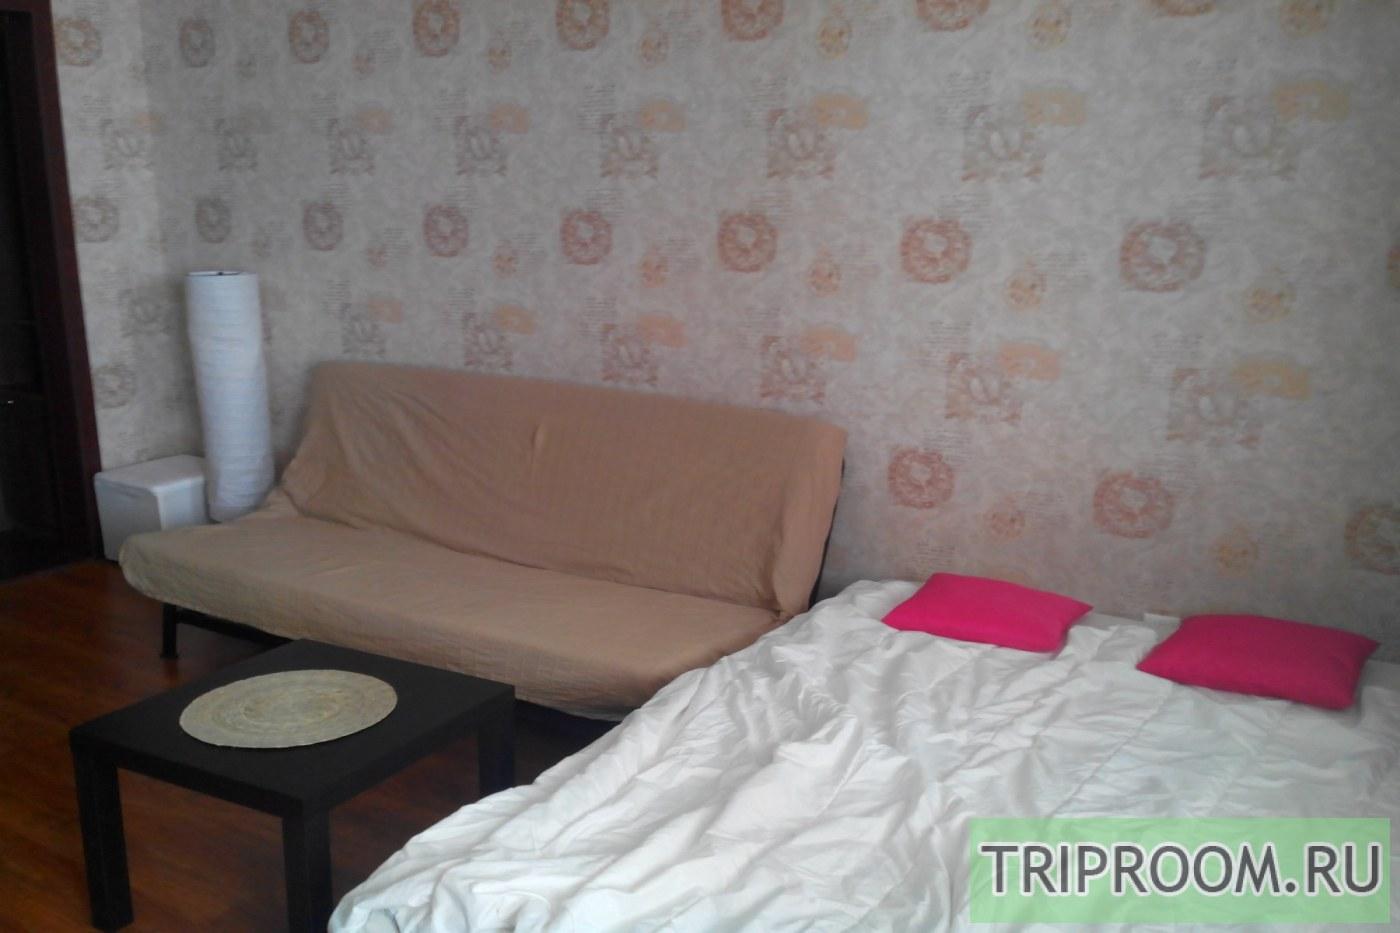 1-комнатная квартира посуточно (вариант № 5762), ул. Горский микрорайон, фото № 2